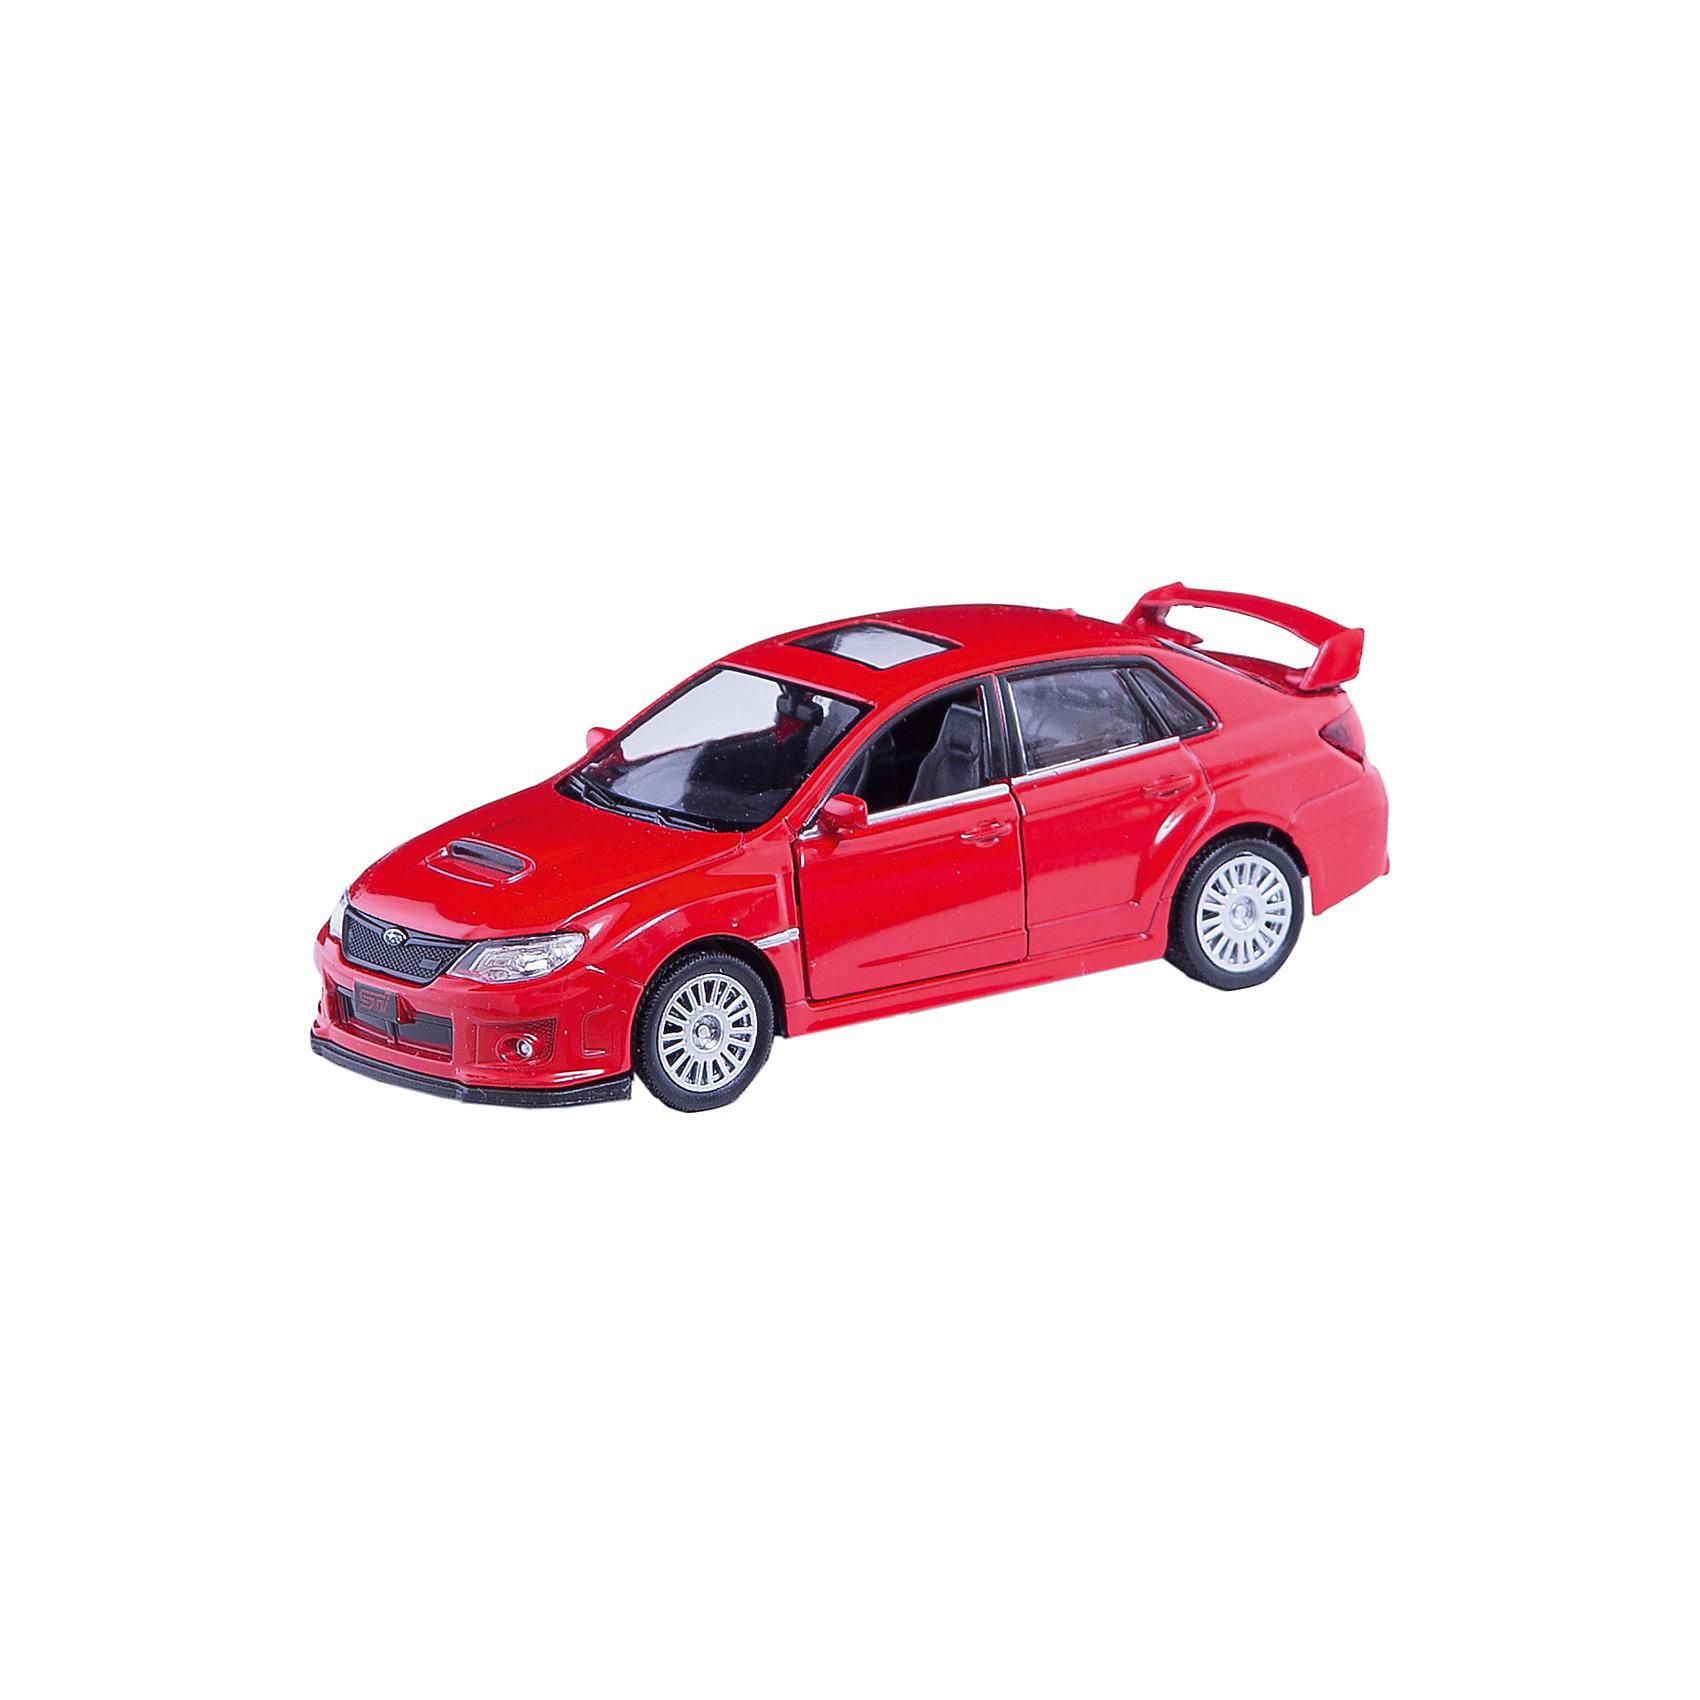 Машинка Subaru WRX STI 5, AutotimeМашинки<br><br><br>Ширина мм: 165<br>Глубина мм: 57<br>Высота мм: 75<br>Вес г: 13<br>Возраст от месяцев: 36<br>Возраст до месяцев: 2147483647<br>Пол: Мужской<br>Возраст: Детский<br>SKU: 5584110